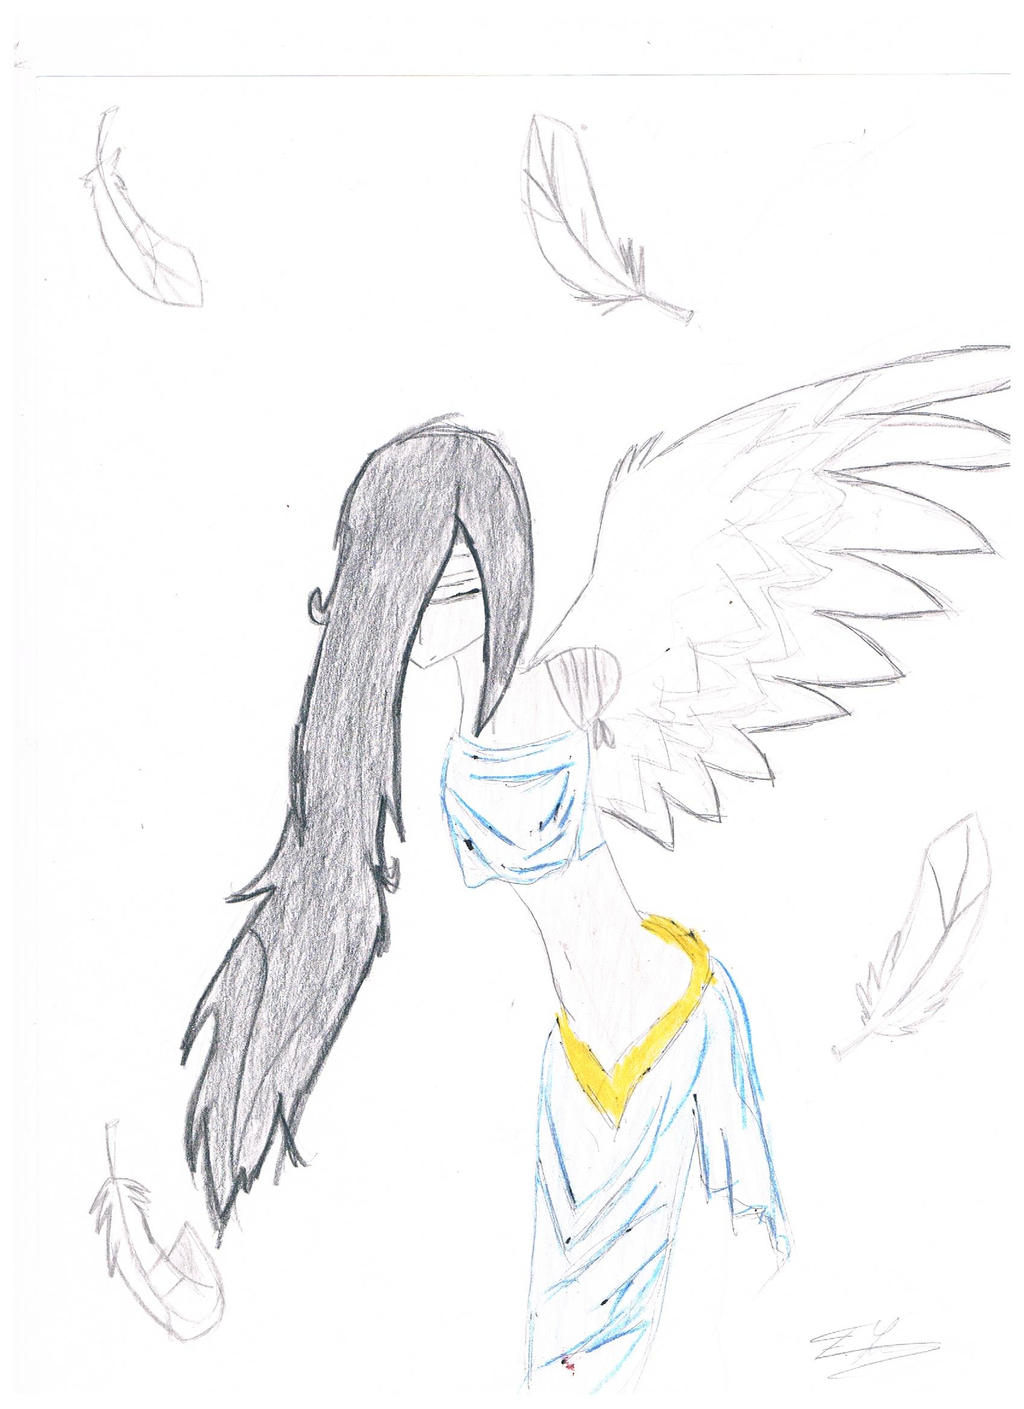 My Guardian Angel by Radarr27 on deviantART